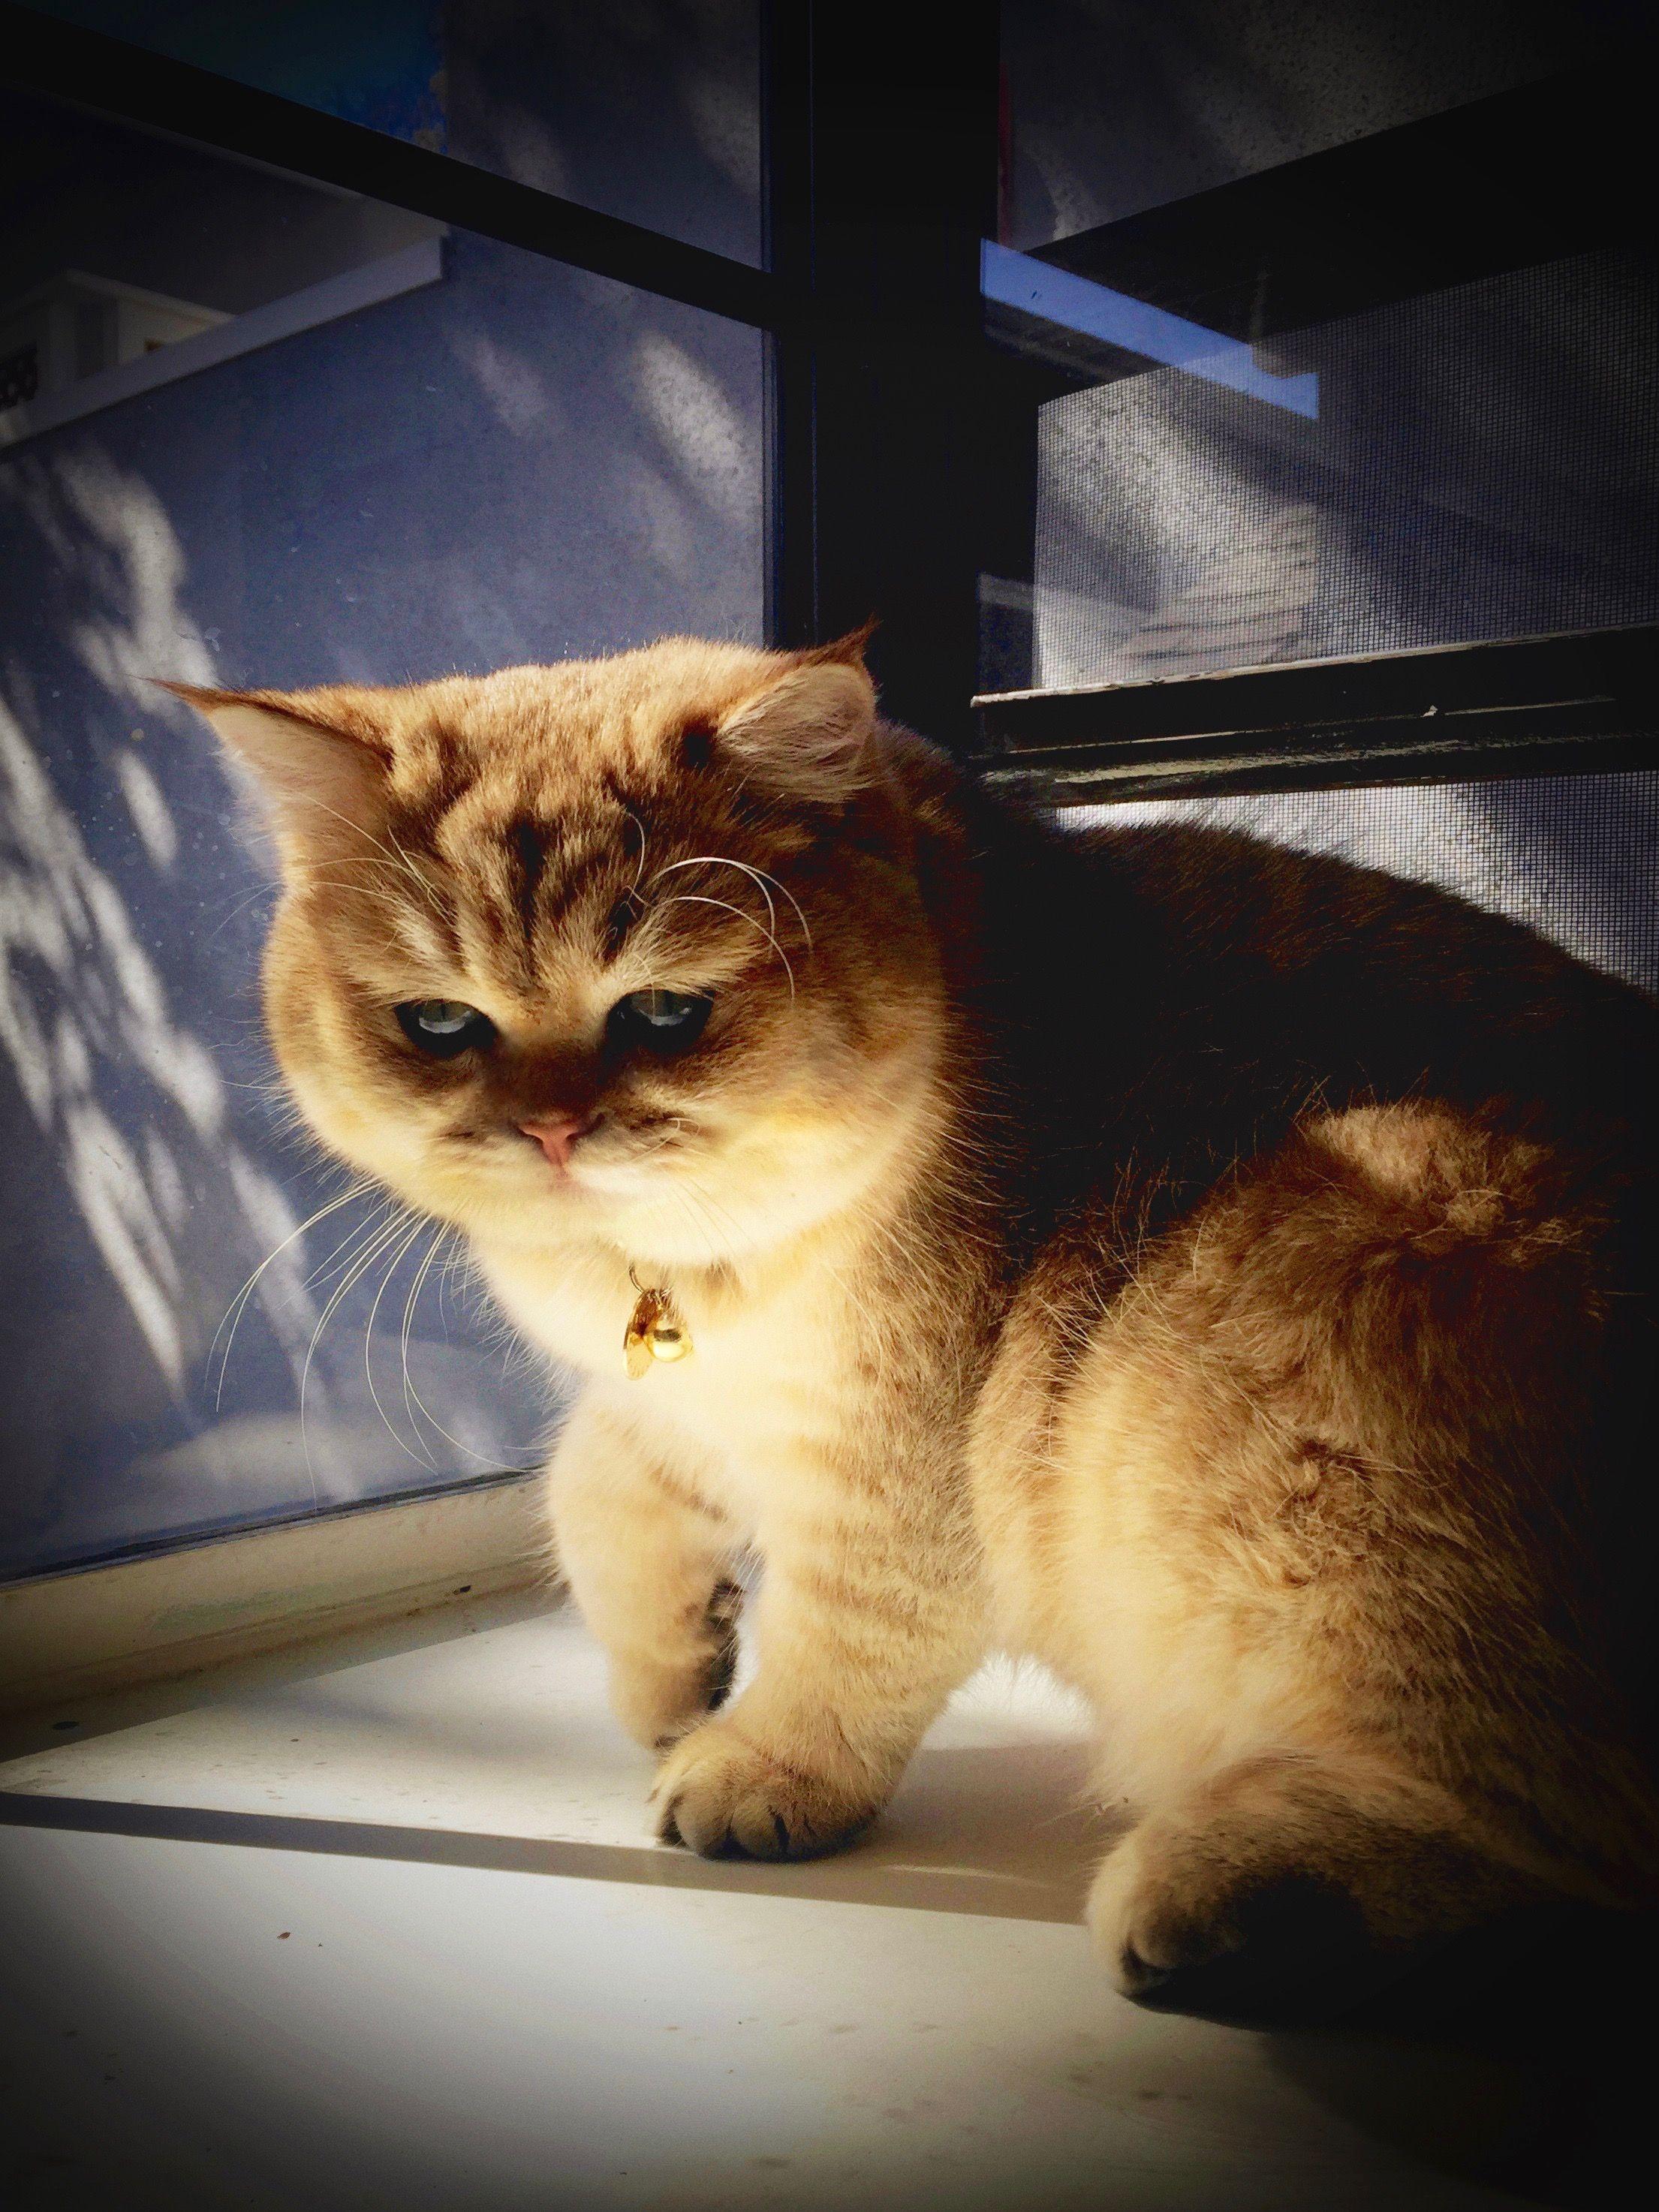 Shaded Golden British Shorthair George Chumley 9 Months Old